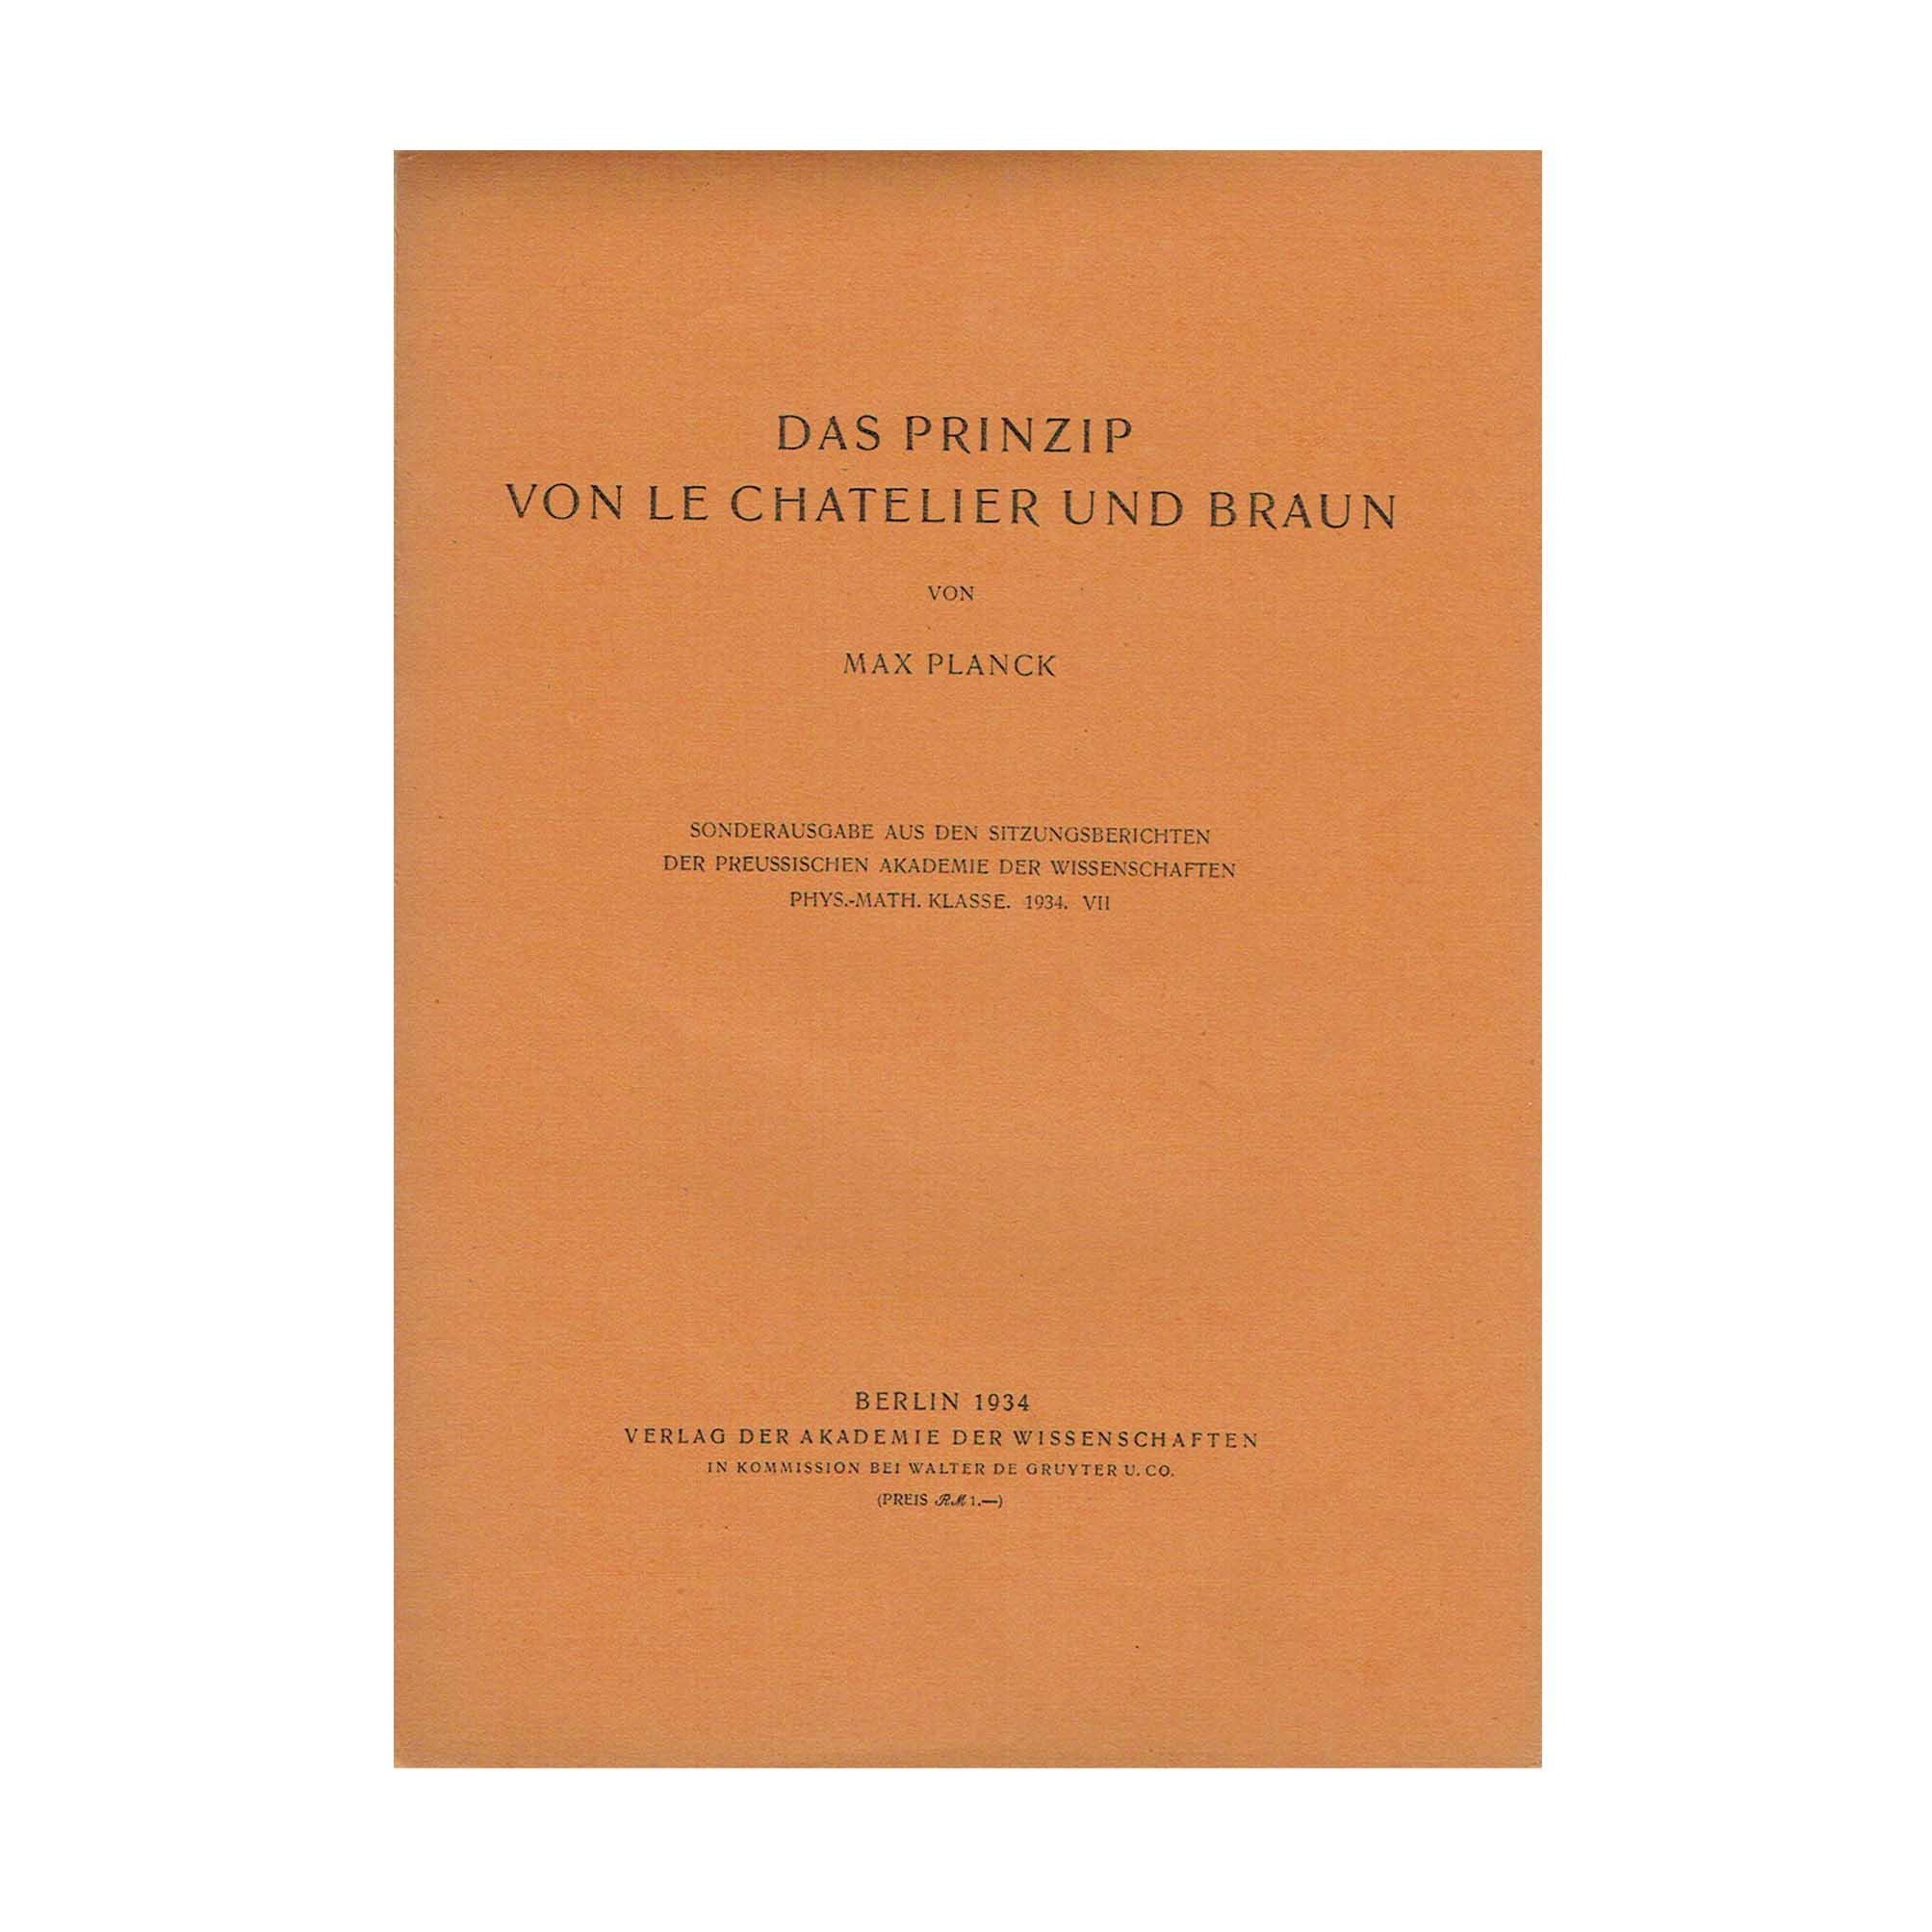 5826K-Planck-Prinzip-Chatelier-Braun-1934-Front-Cover-N.jpeg